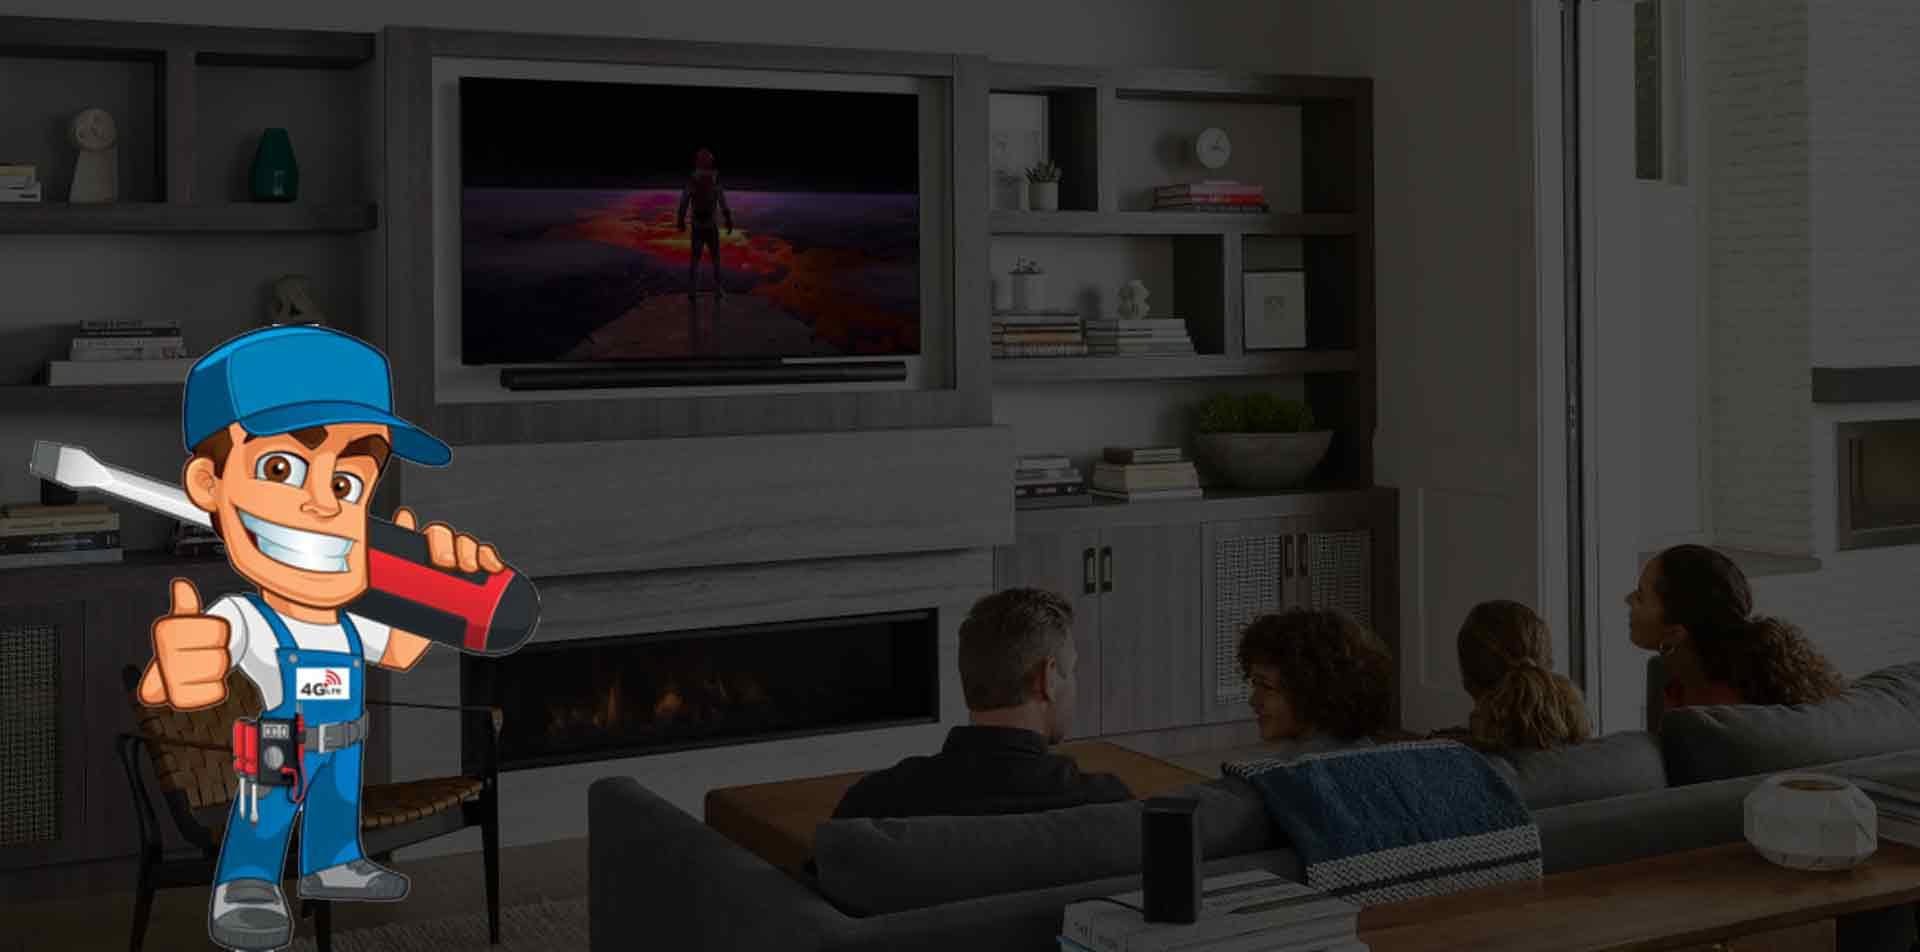 تعمیرات تلویزیون یوتکس ذر منزل